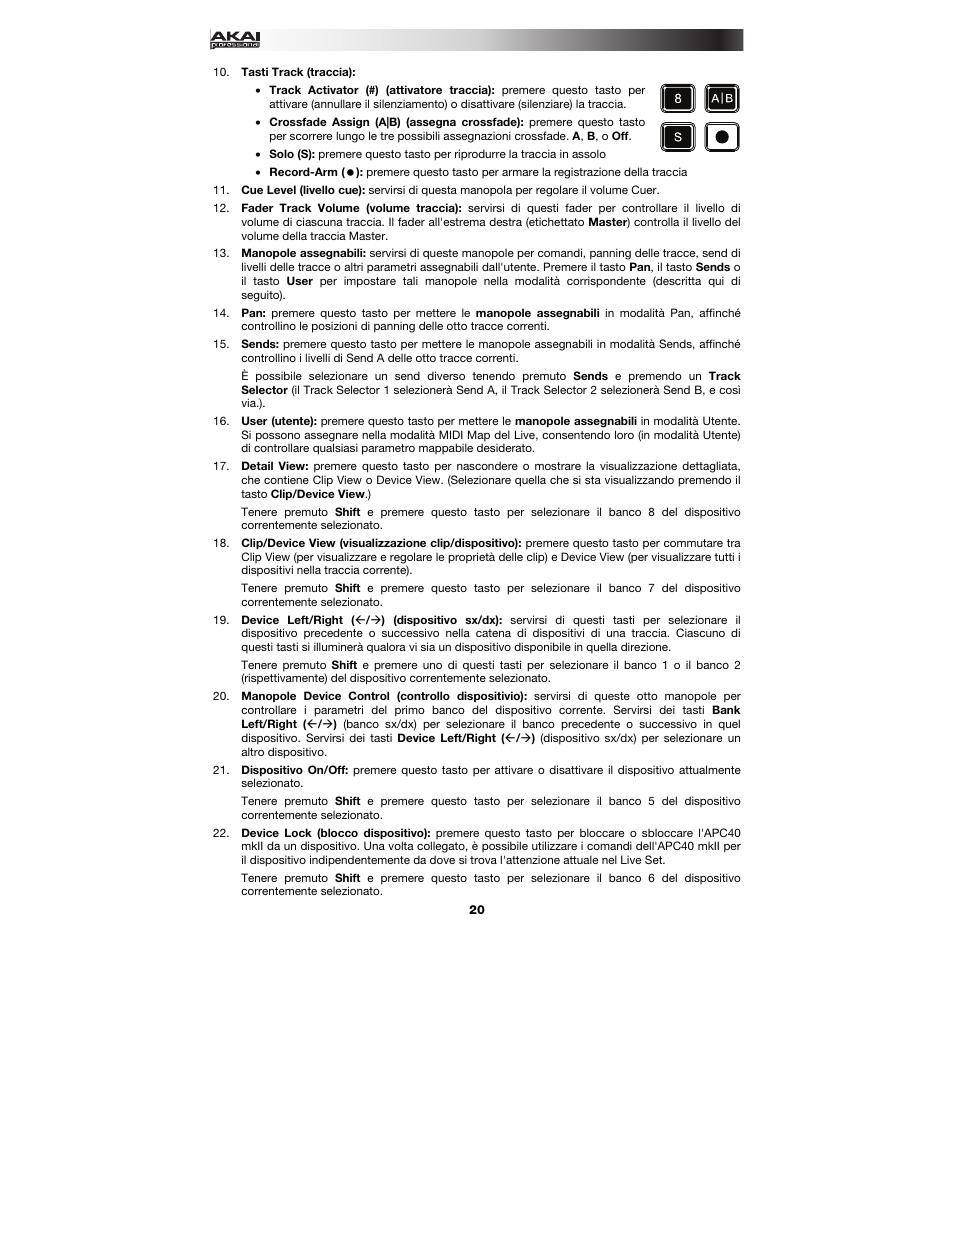 Braun Thermoscan Hm3 Manual Online User Manual